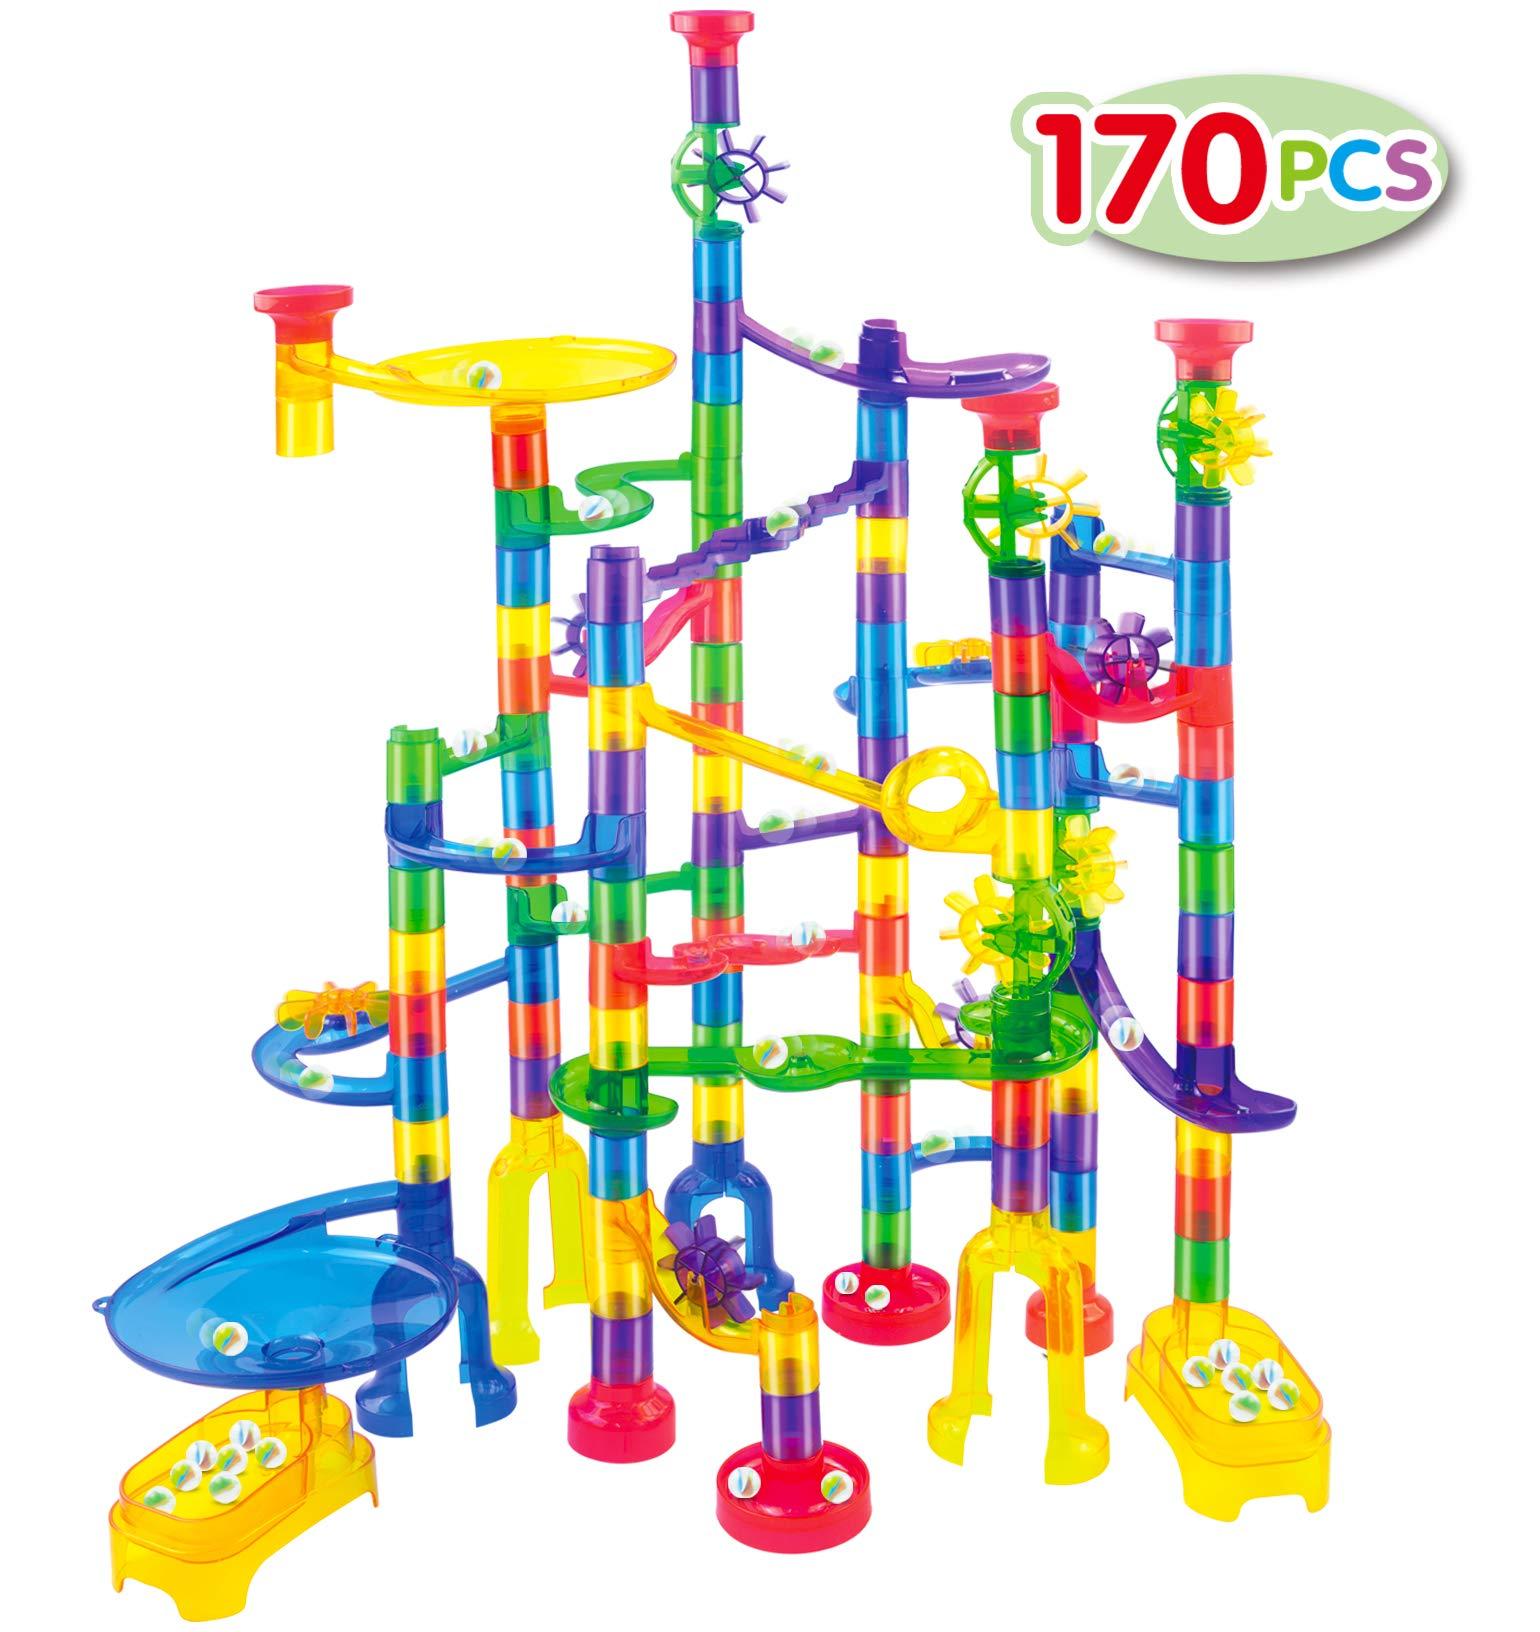 Update 90 Translucent Marbulous Pcs /& 32 Pcs DIY Marbles+6 Glass Marbles FUNTOK Marble Run Set 128Pcs Marble Maze Game Marble Race Track Building Toy for Kid Building Blocks Educational Toys